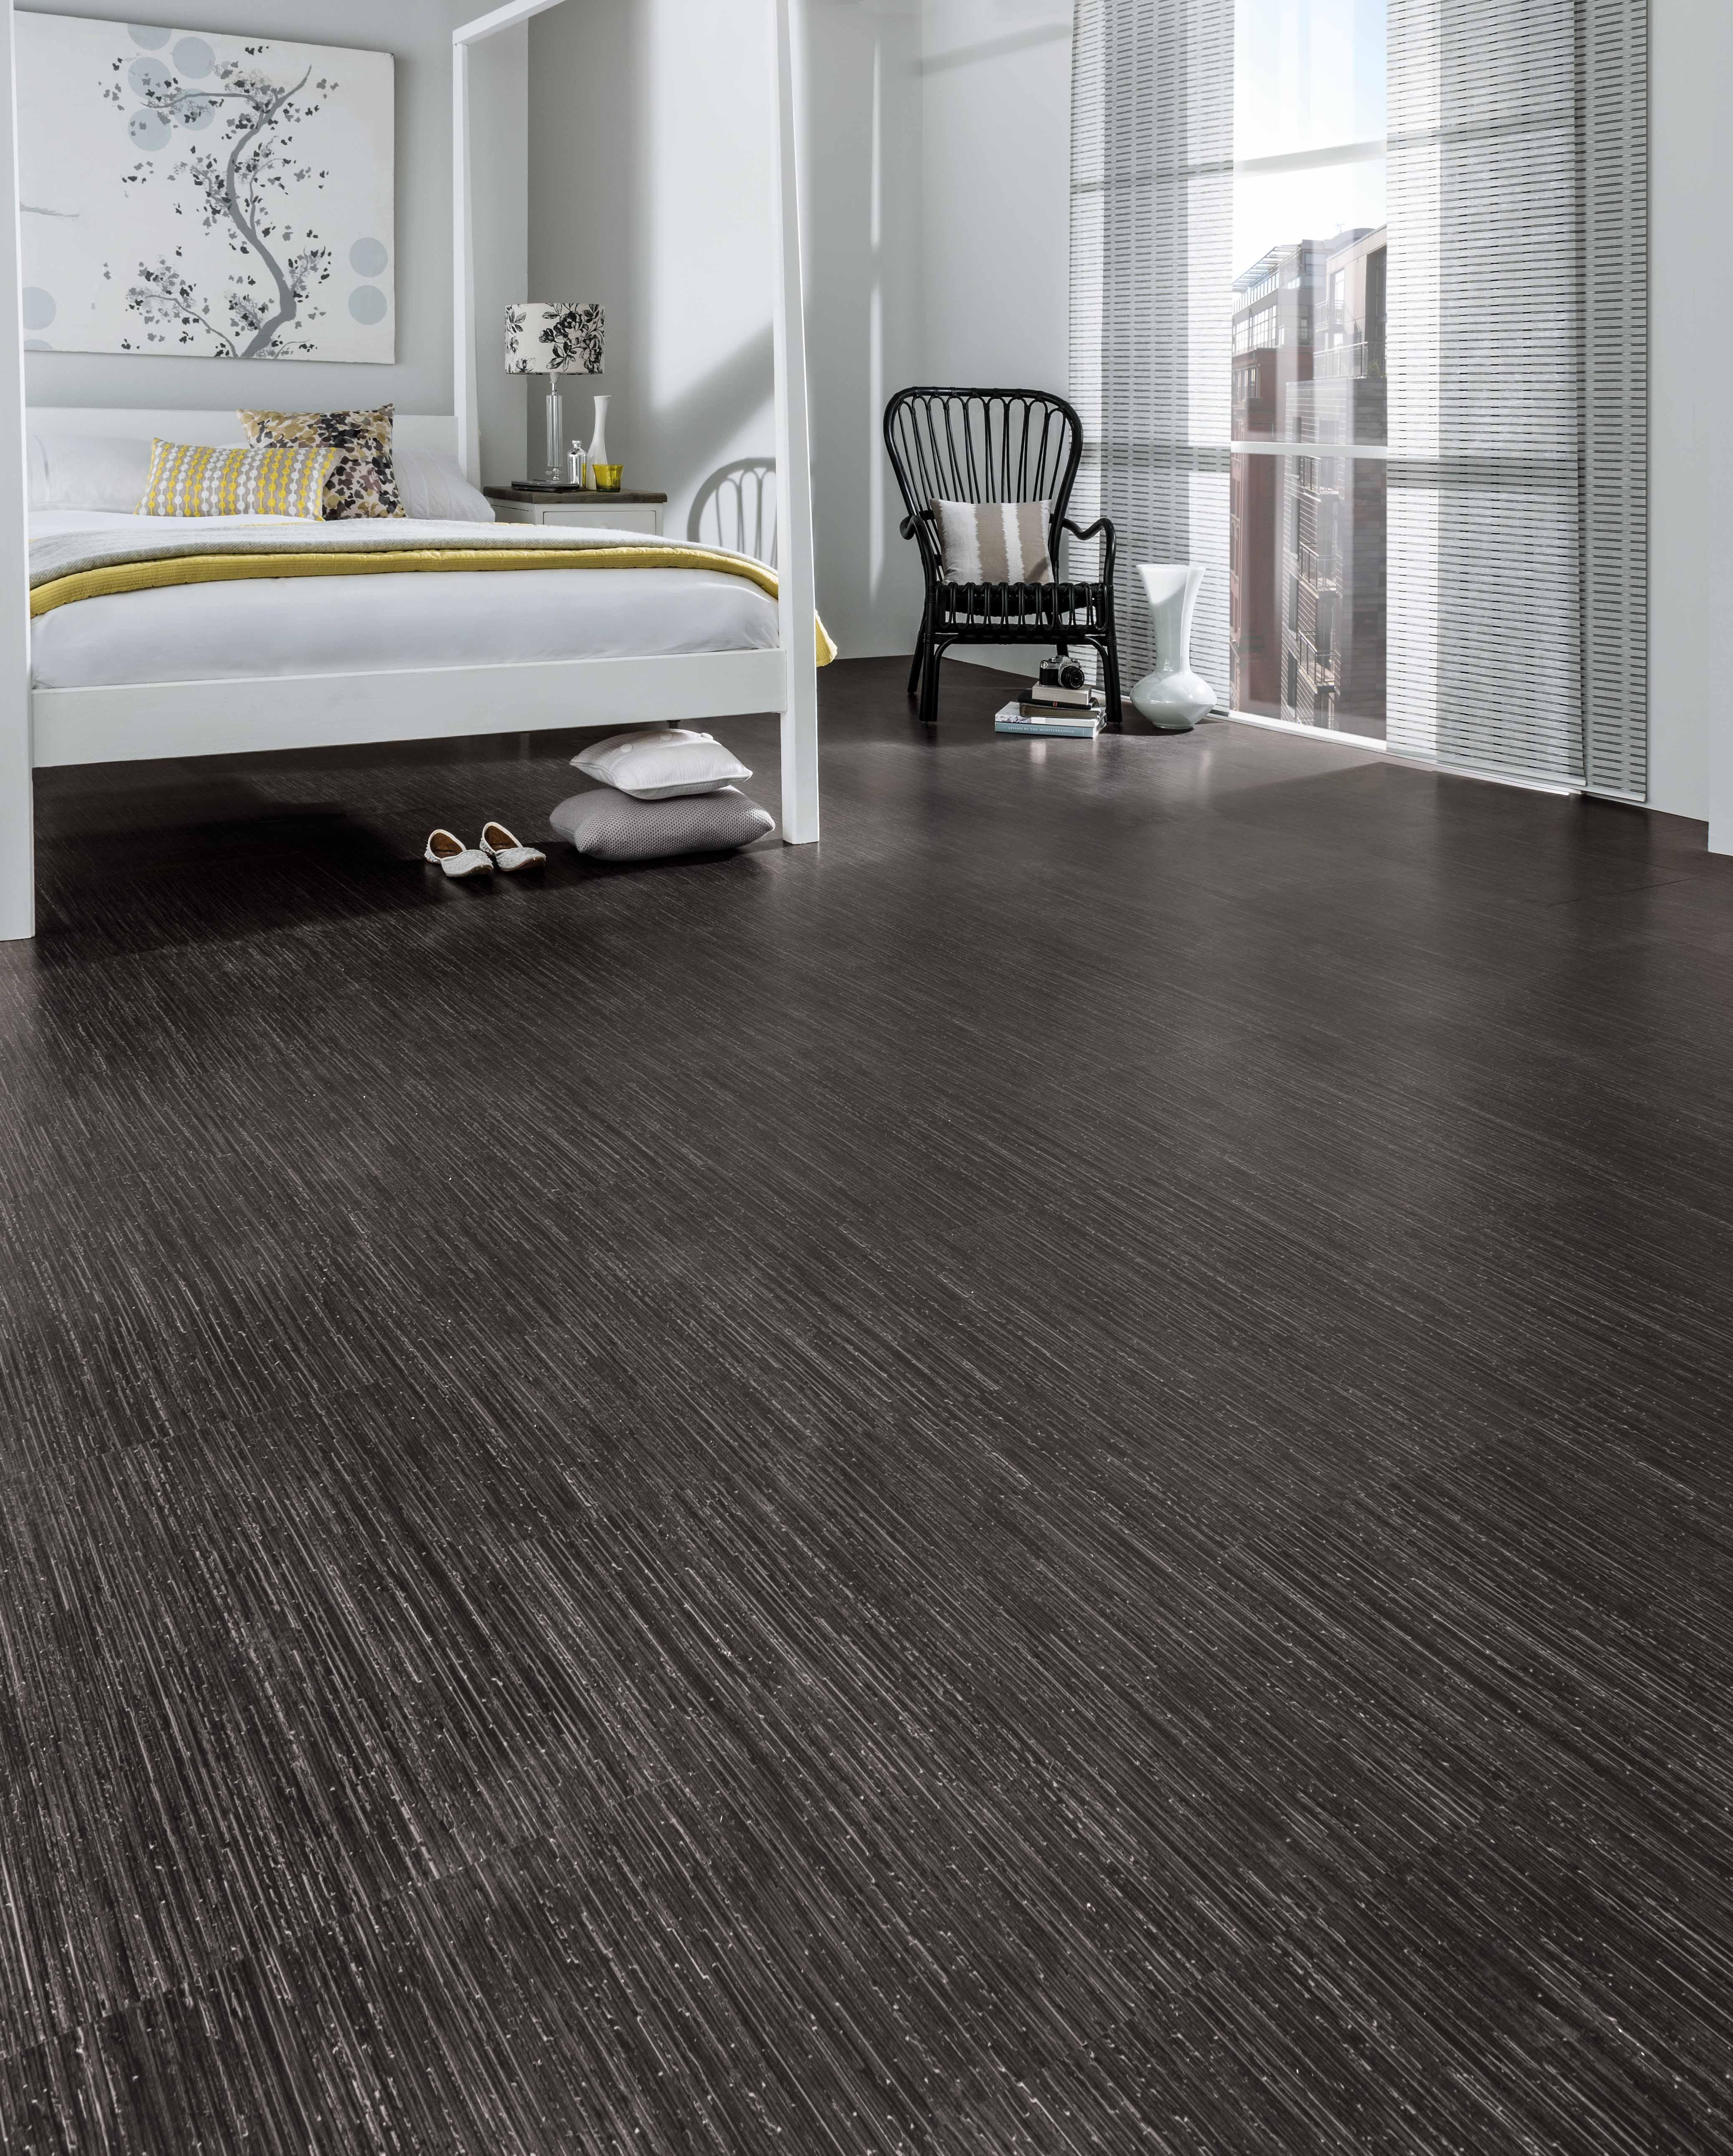 floor in karndean tile bolton vinyl oak flooring lancashire p manchester farnworth luxury country